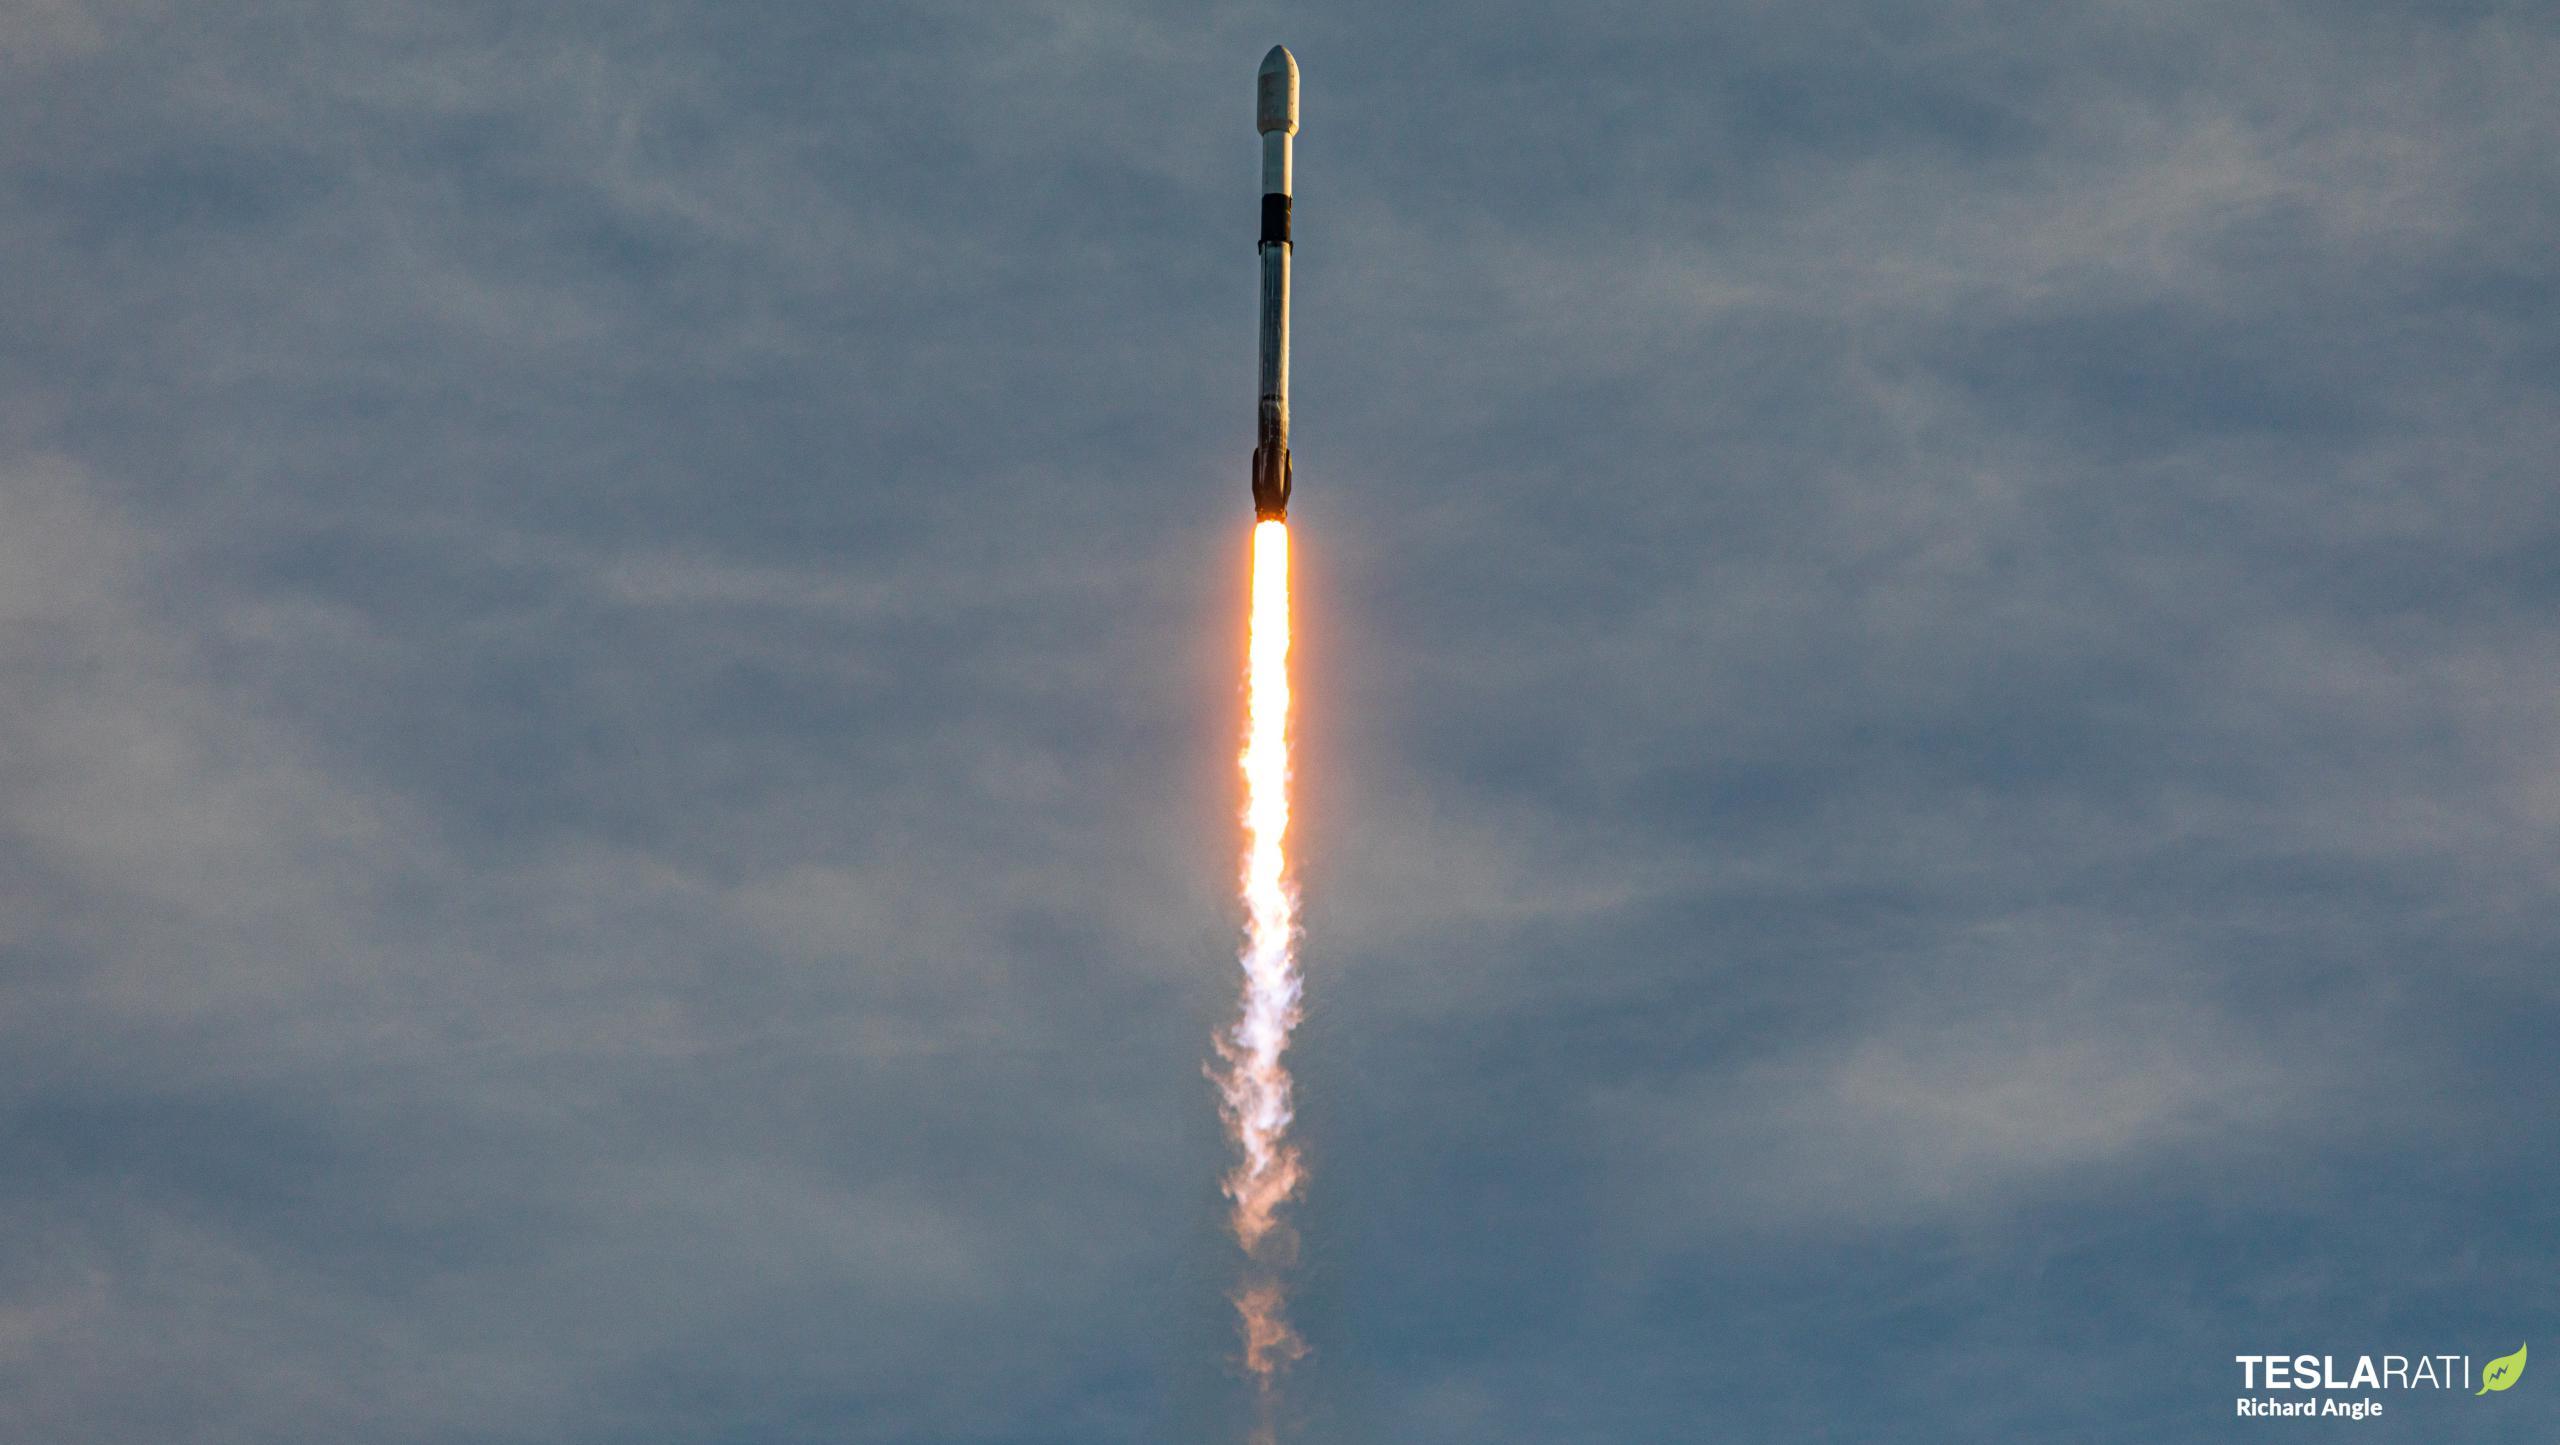 Starlink-16 Falcon 9 B1051 39A 012021 (Richard Angle) launch 2 crop (c)